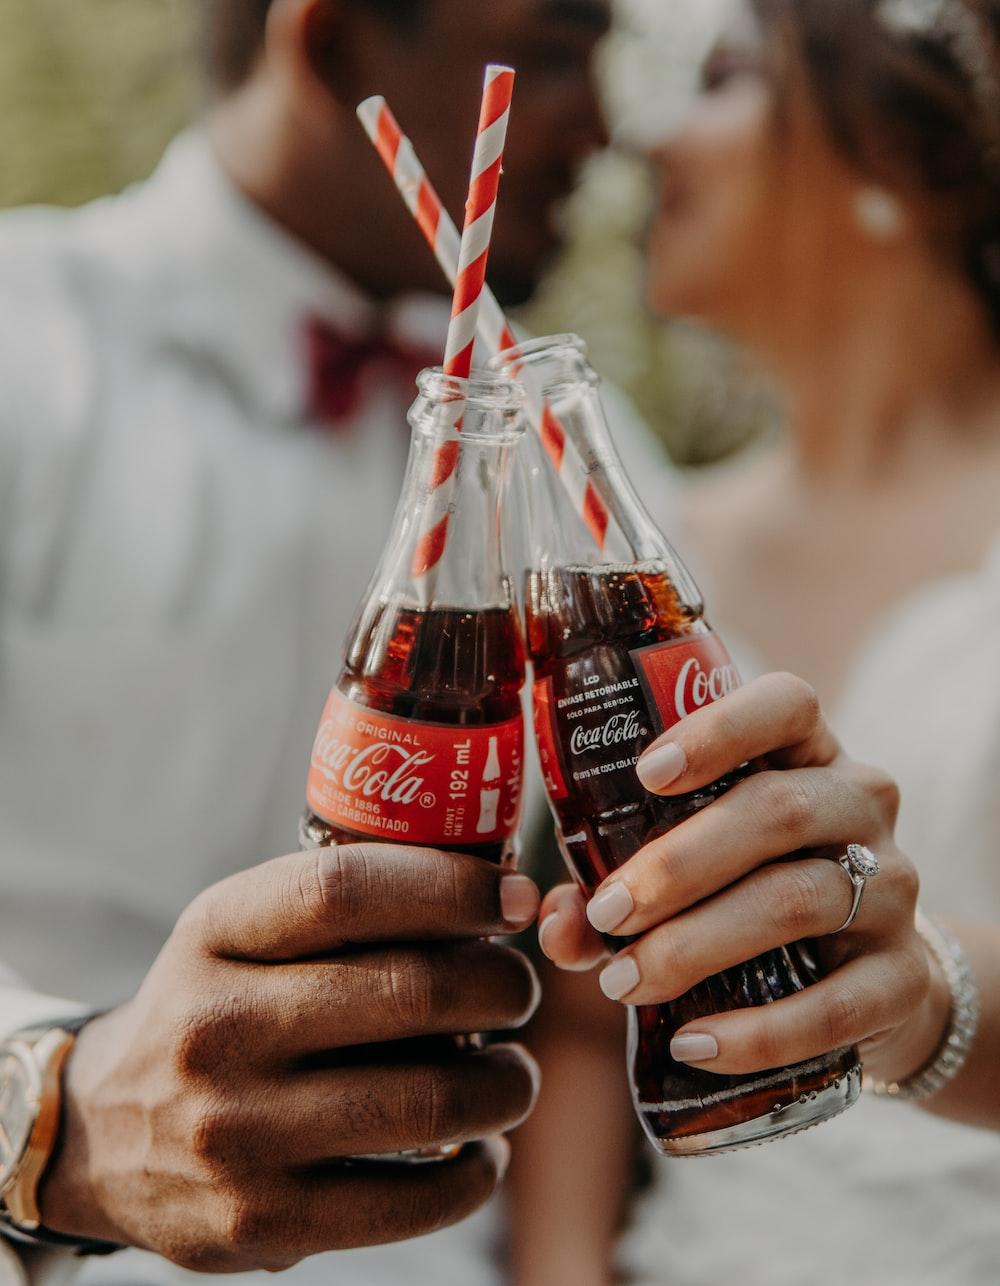 person holding coca cola bottle